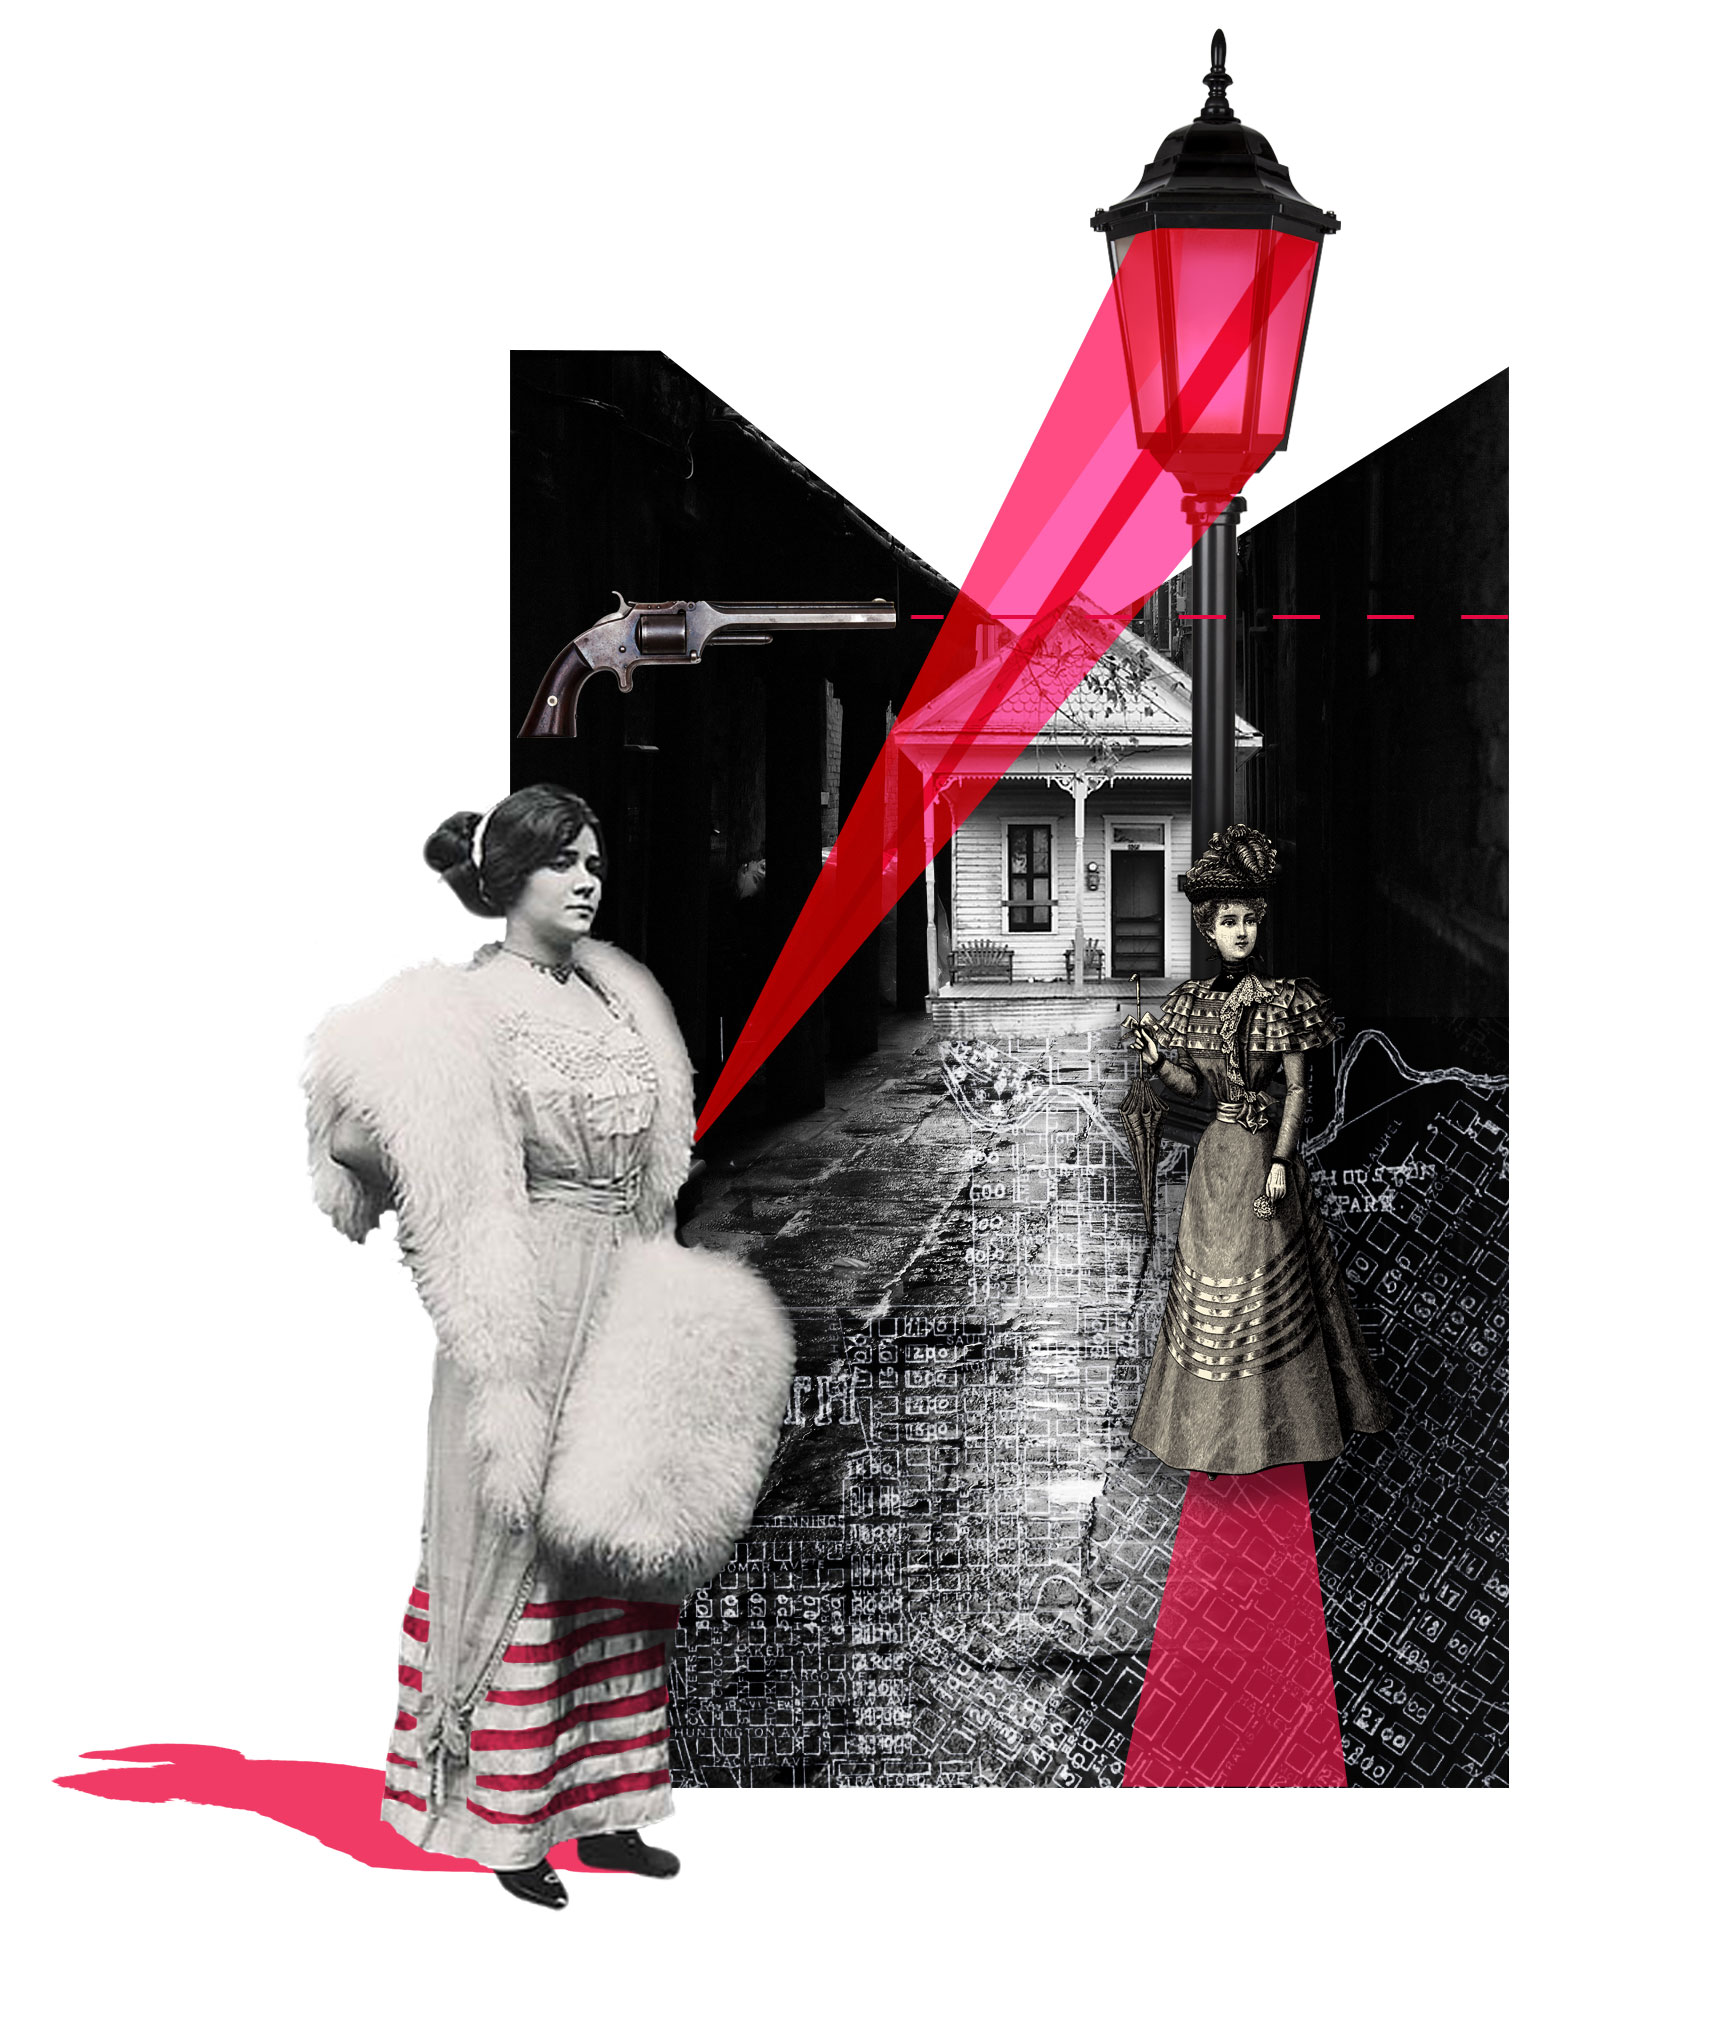 collage editorial illustration digital montage red light district.jpg